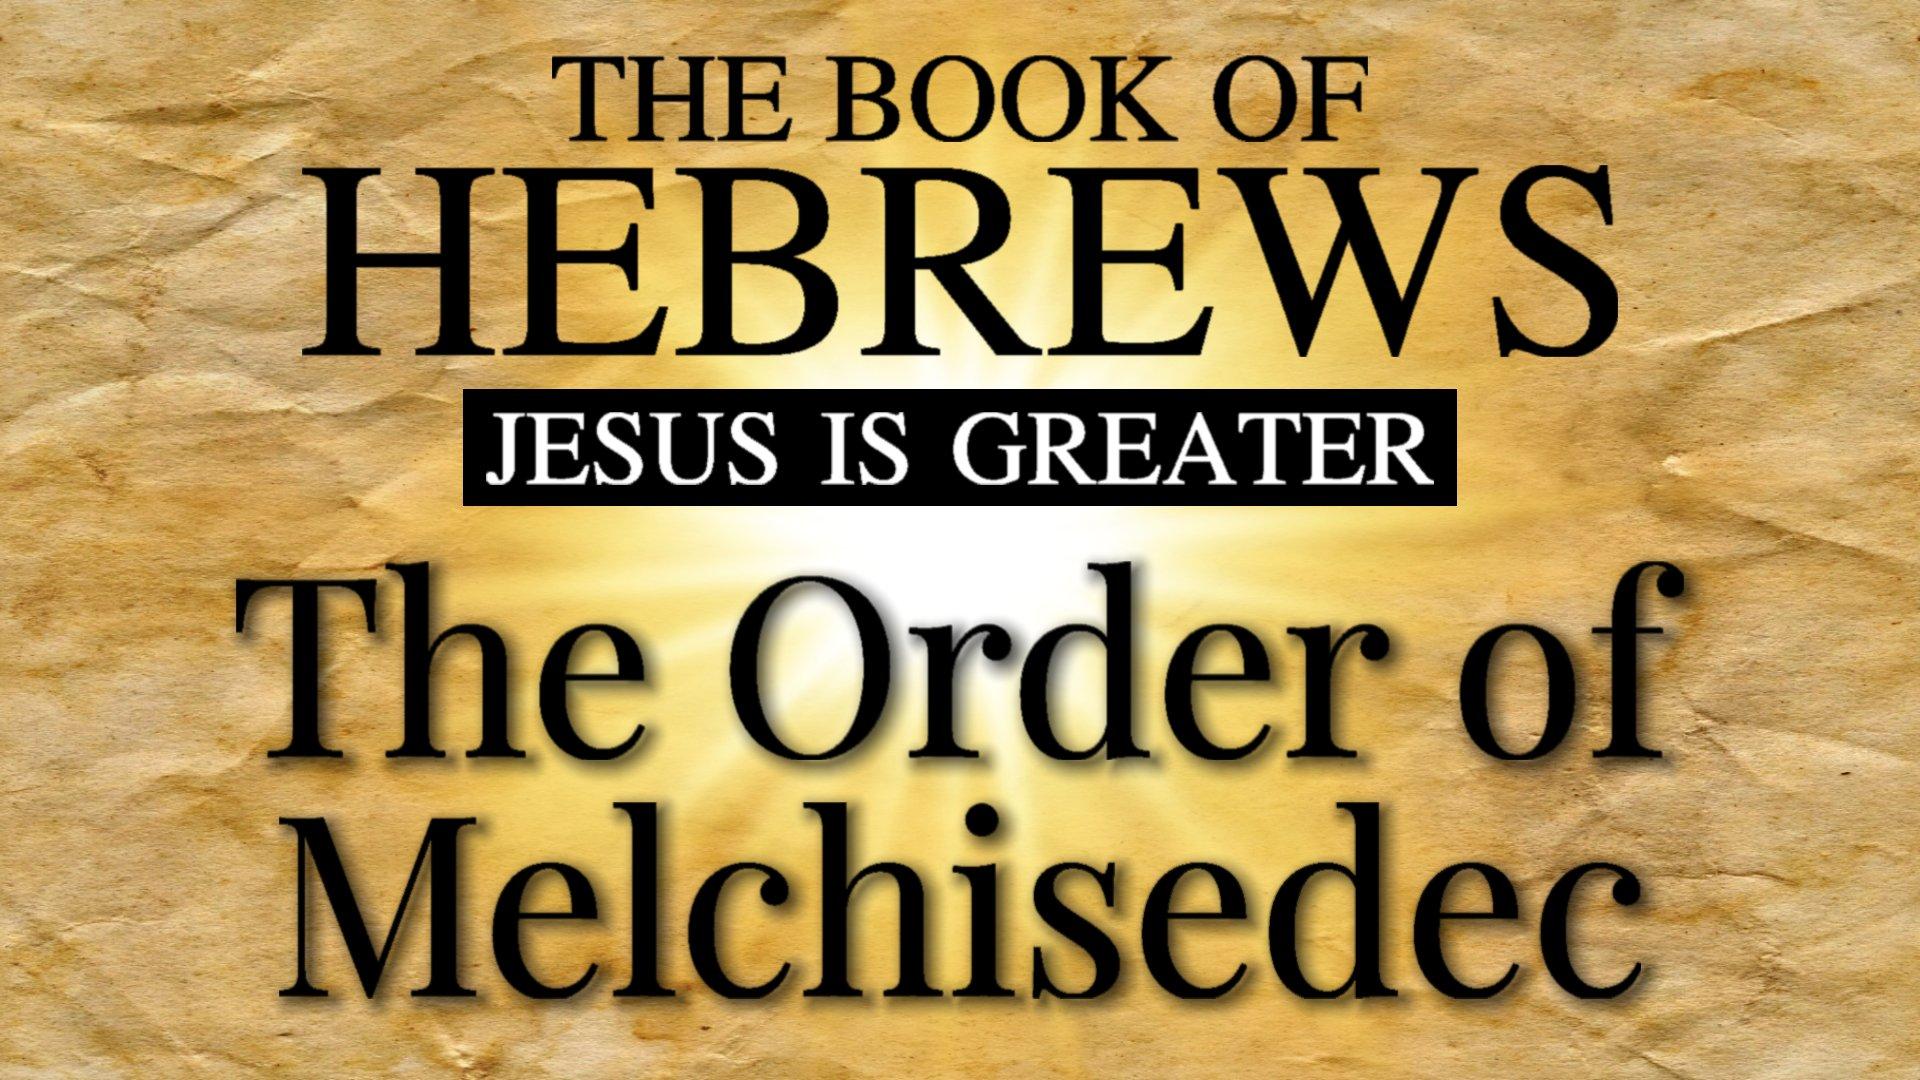 14 The Order of Melchisedec